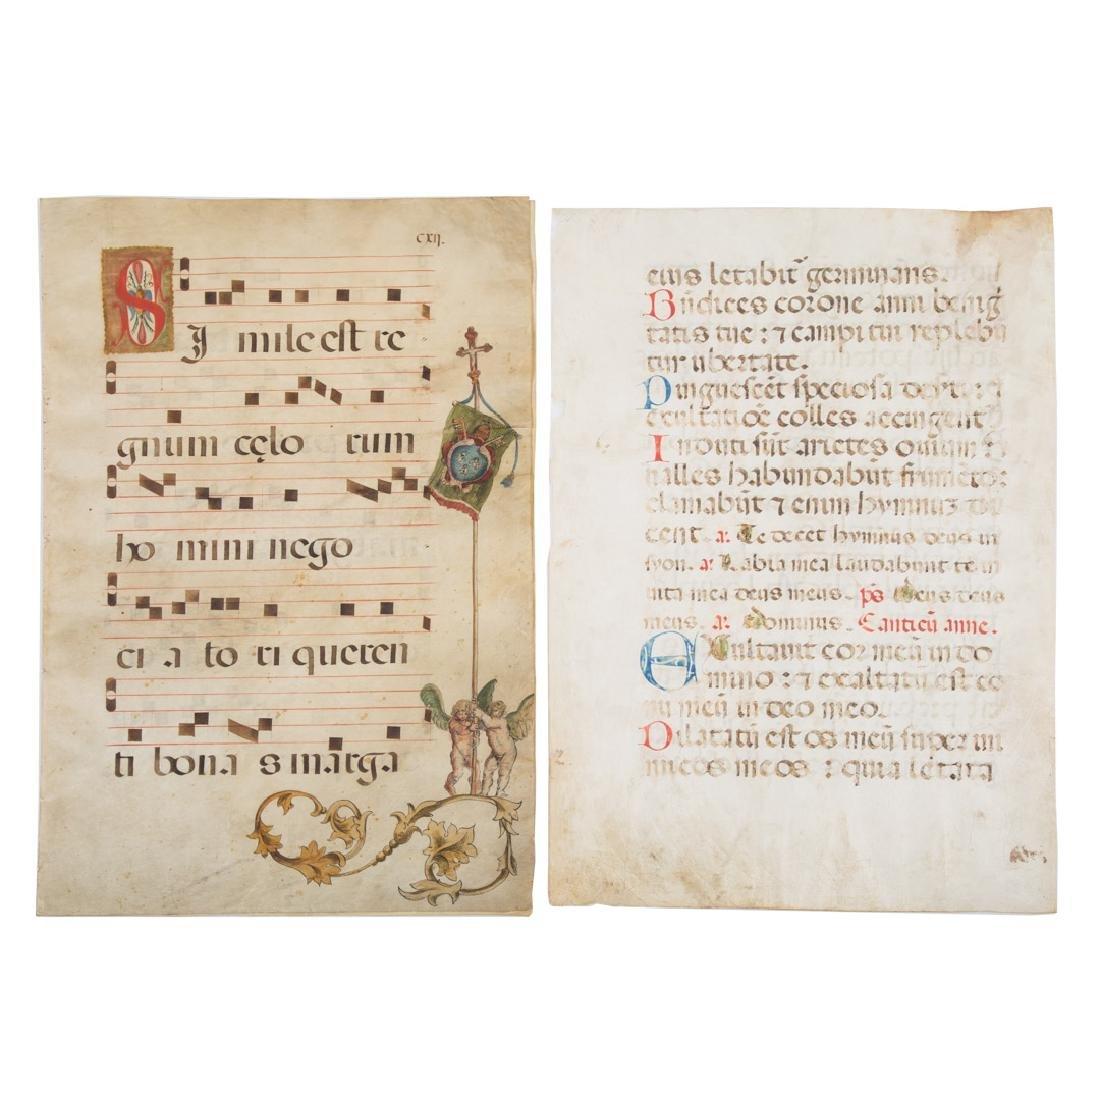 Three leaves from Italian Antiphonal, 17th c.